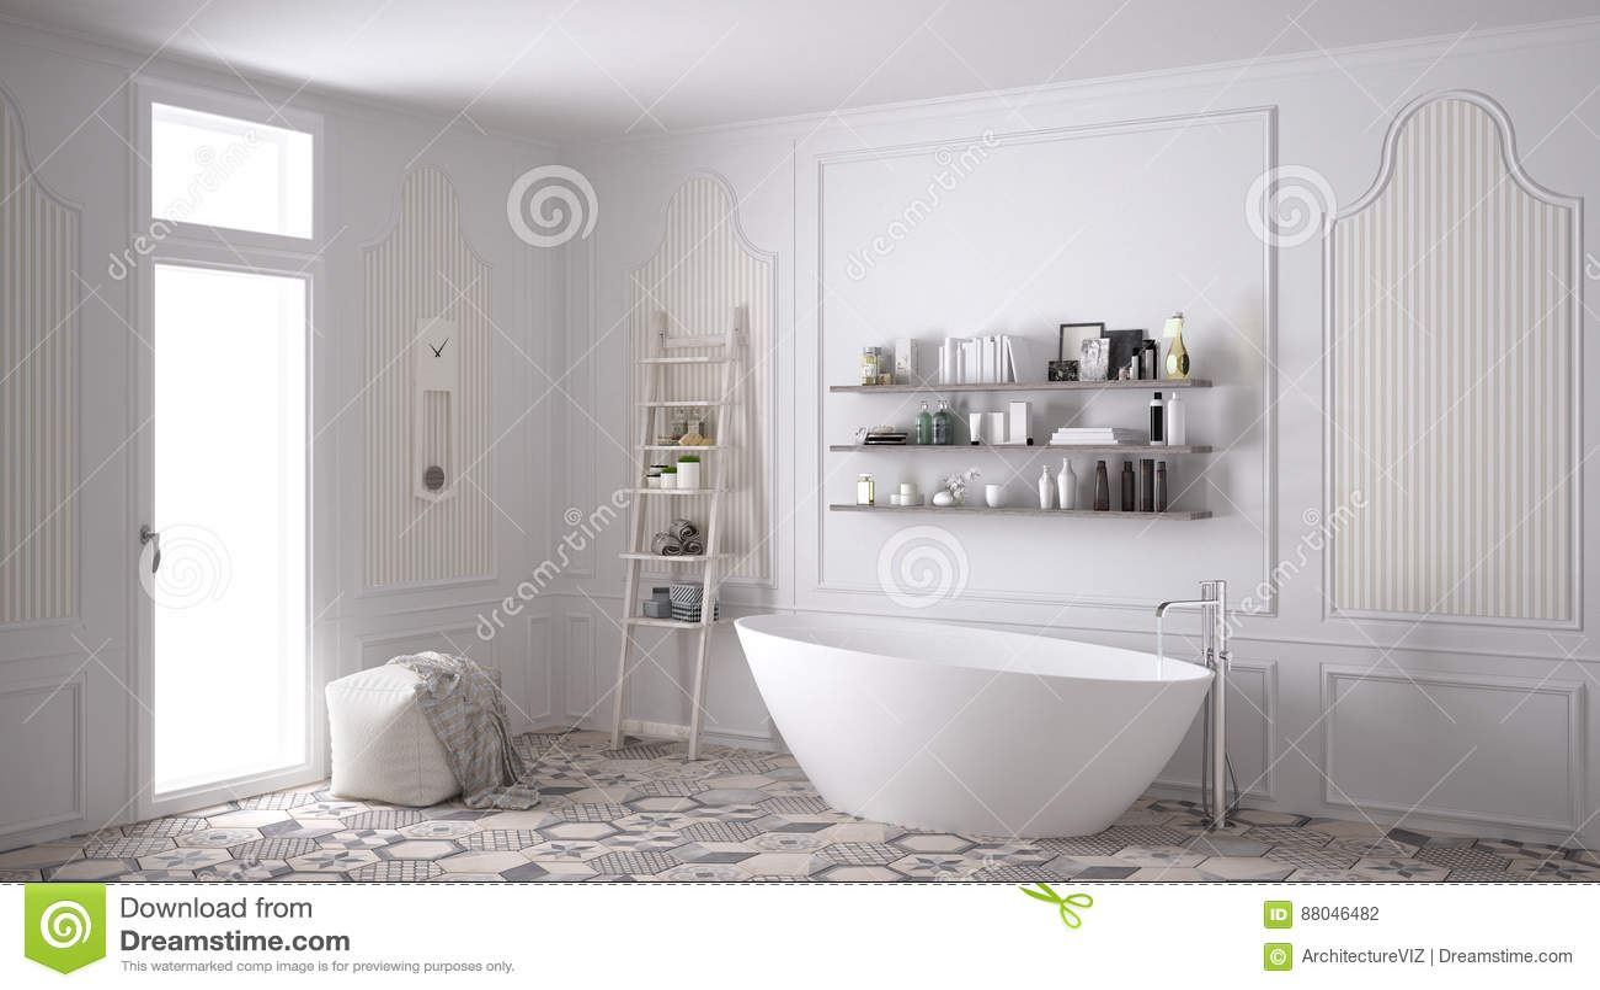 Bagno Design Scandinavo : Bagno scandinavo interior design dannata bianco classico